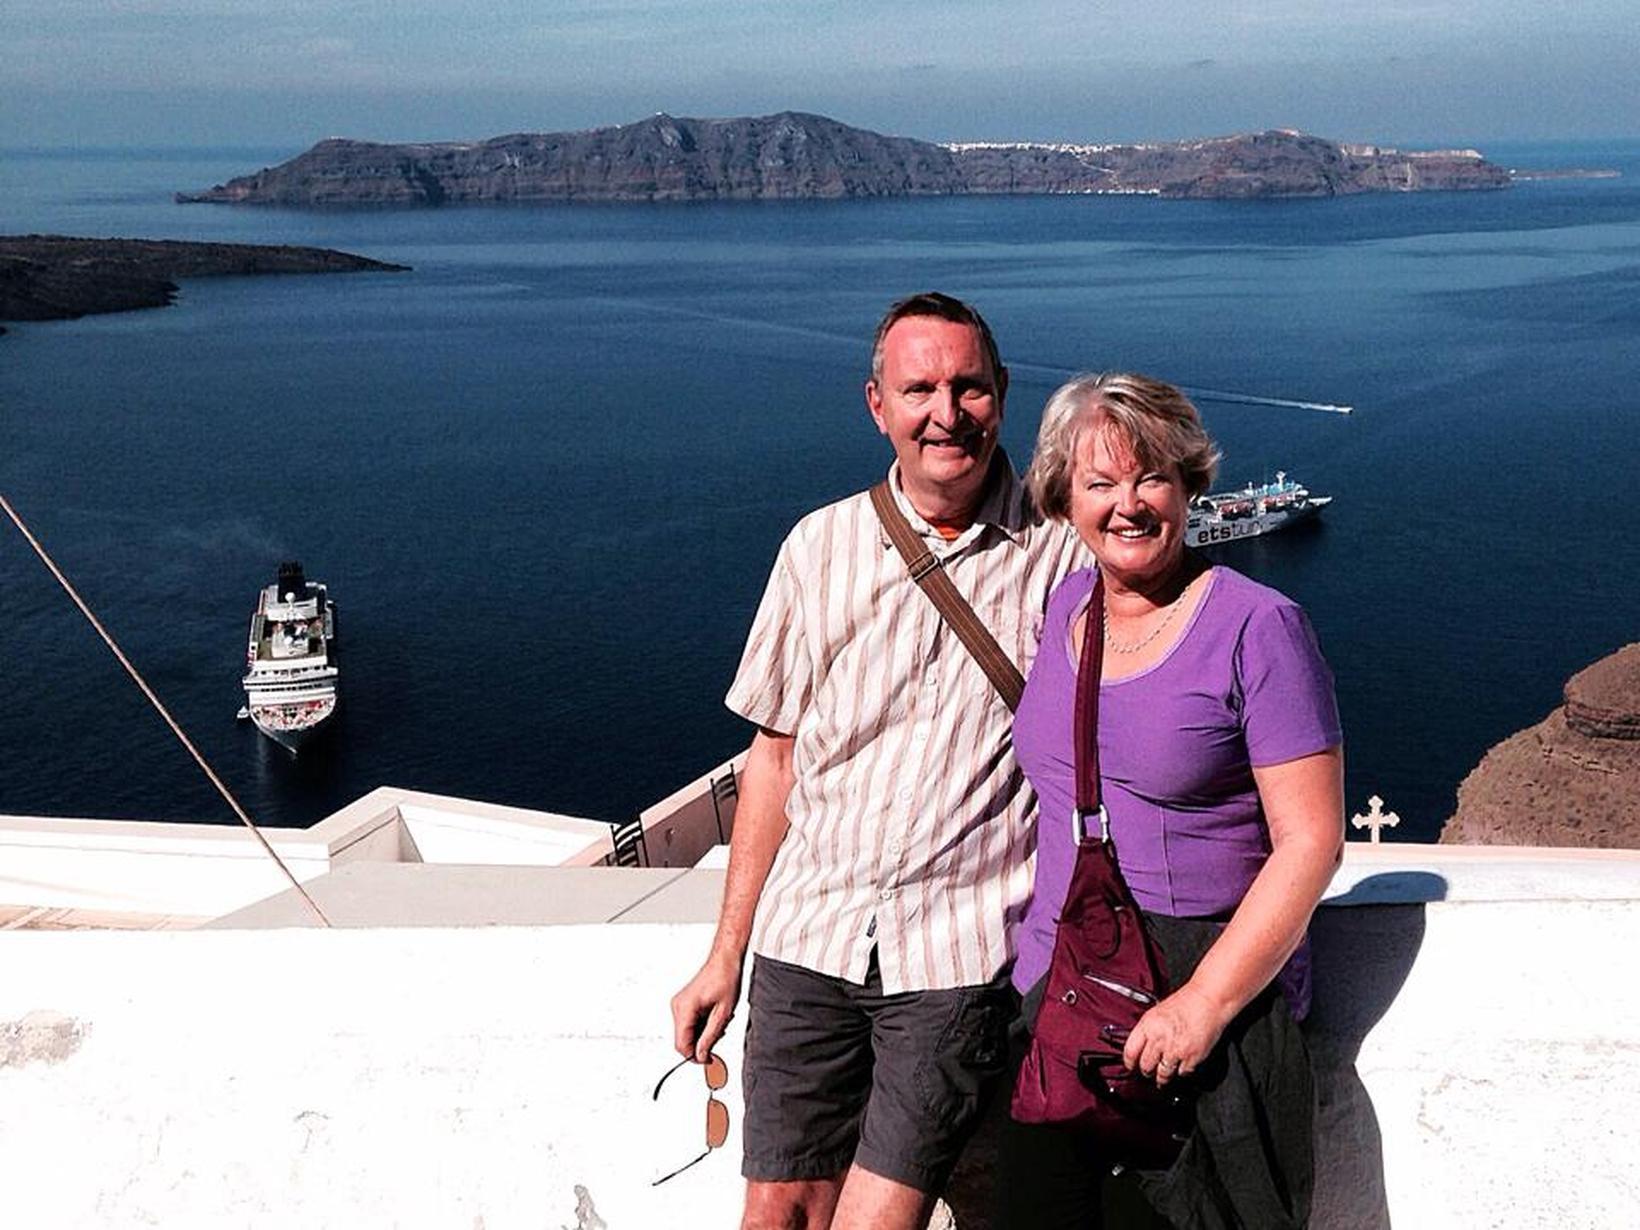 Kate & Robert from Victoria, British Columbia, Canada